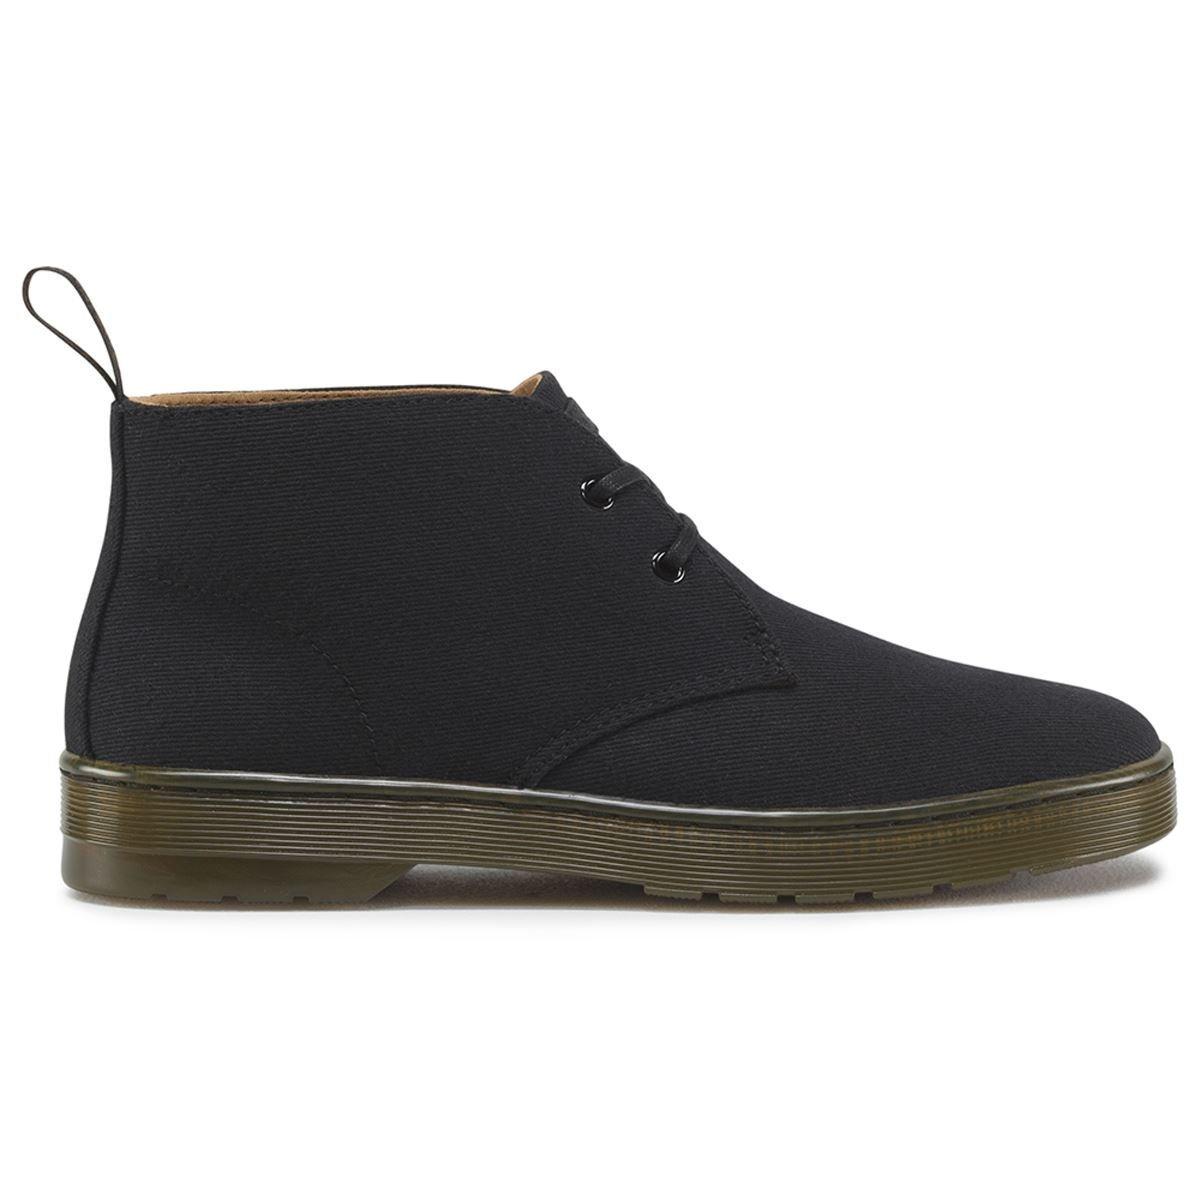 8732e9f2499 Dr. Martens Men's Mayport Chukka Boot